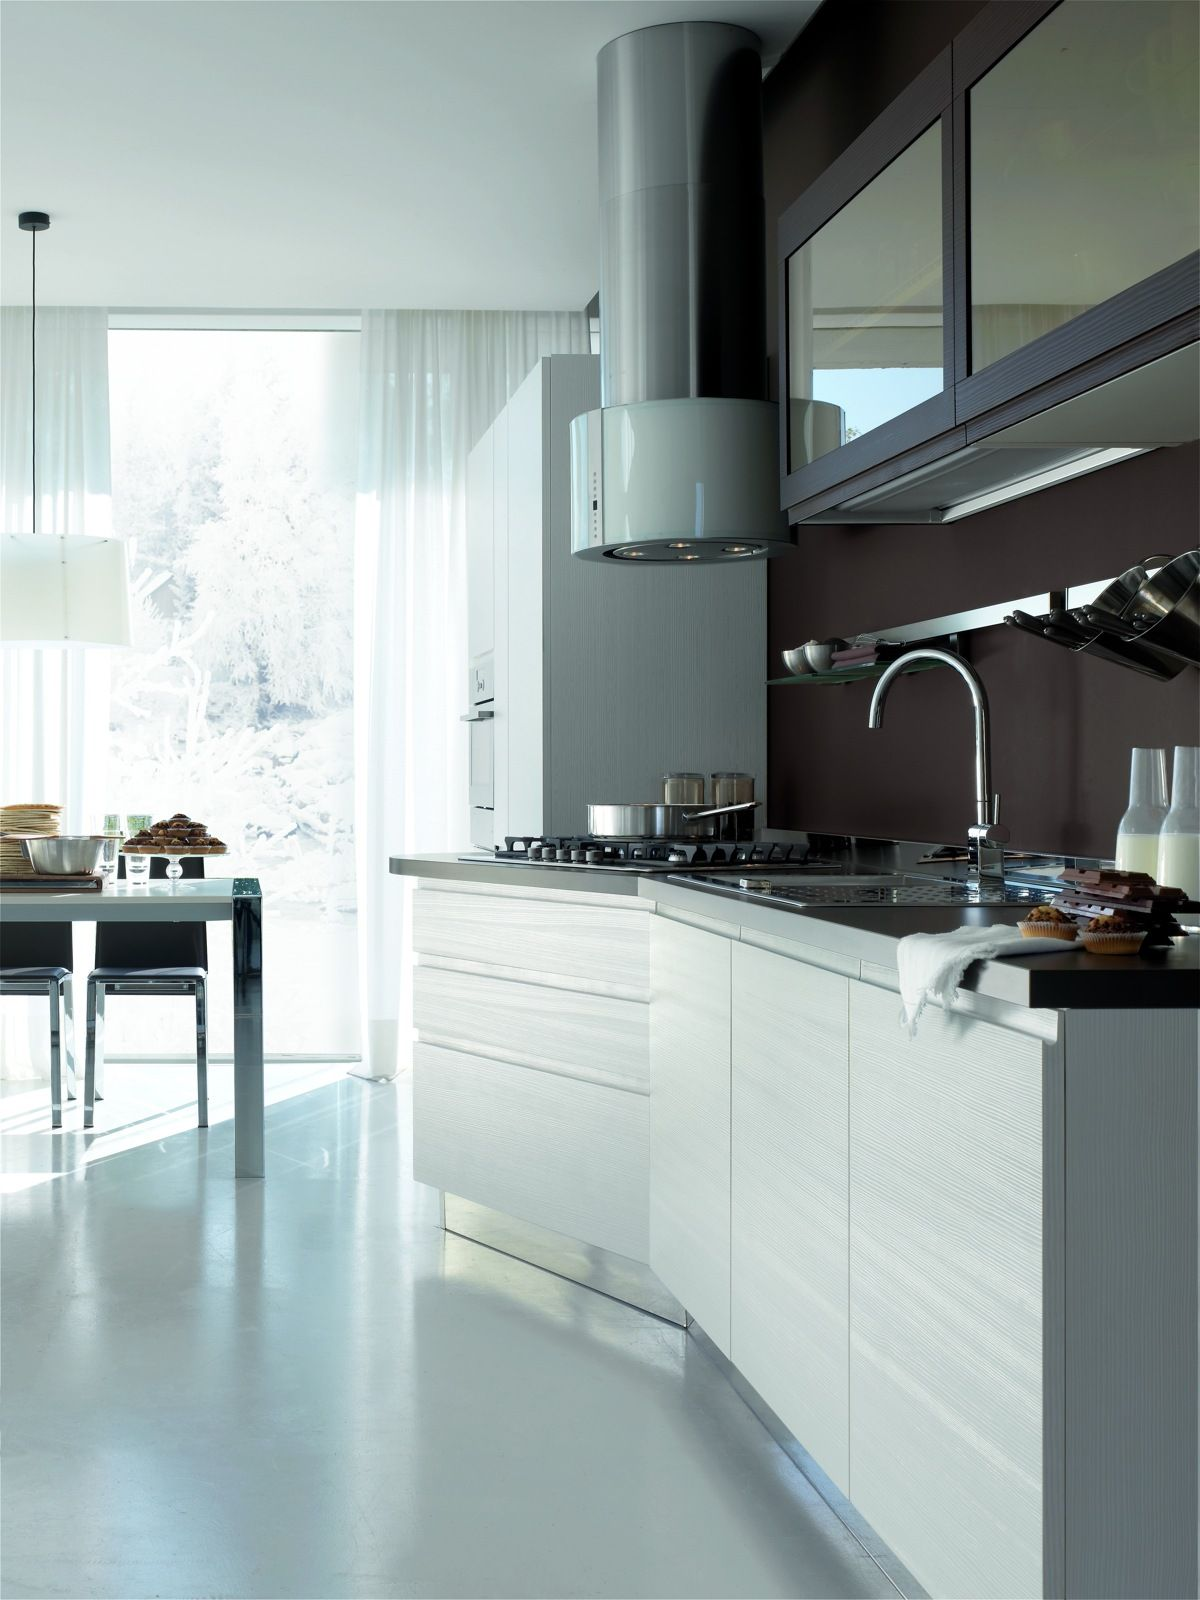 Cucina Stosa Bring | Stosa Point Roma | cucina stosa ...